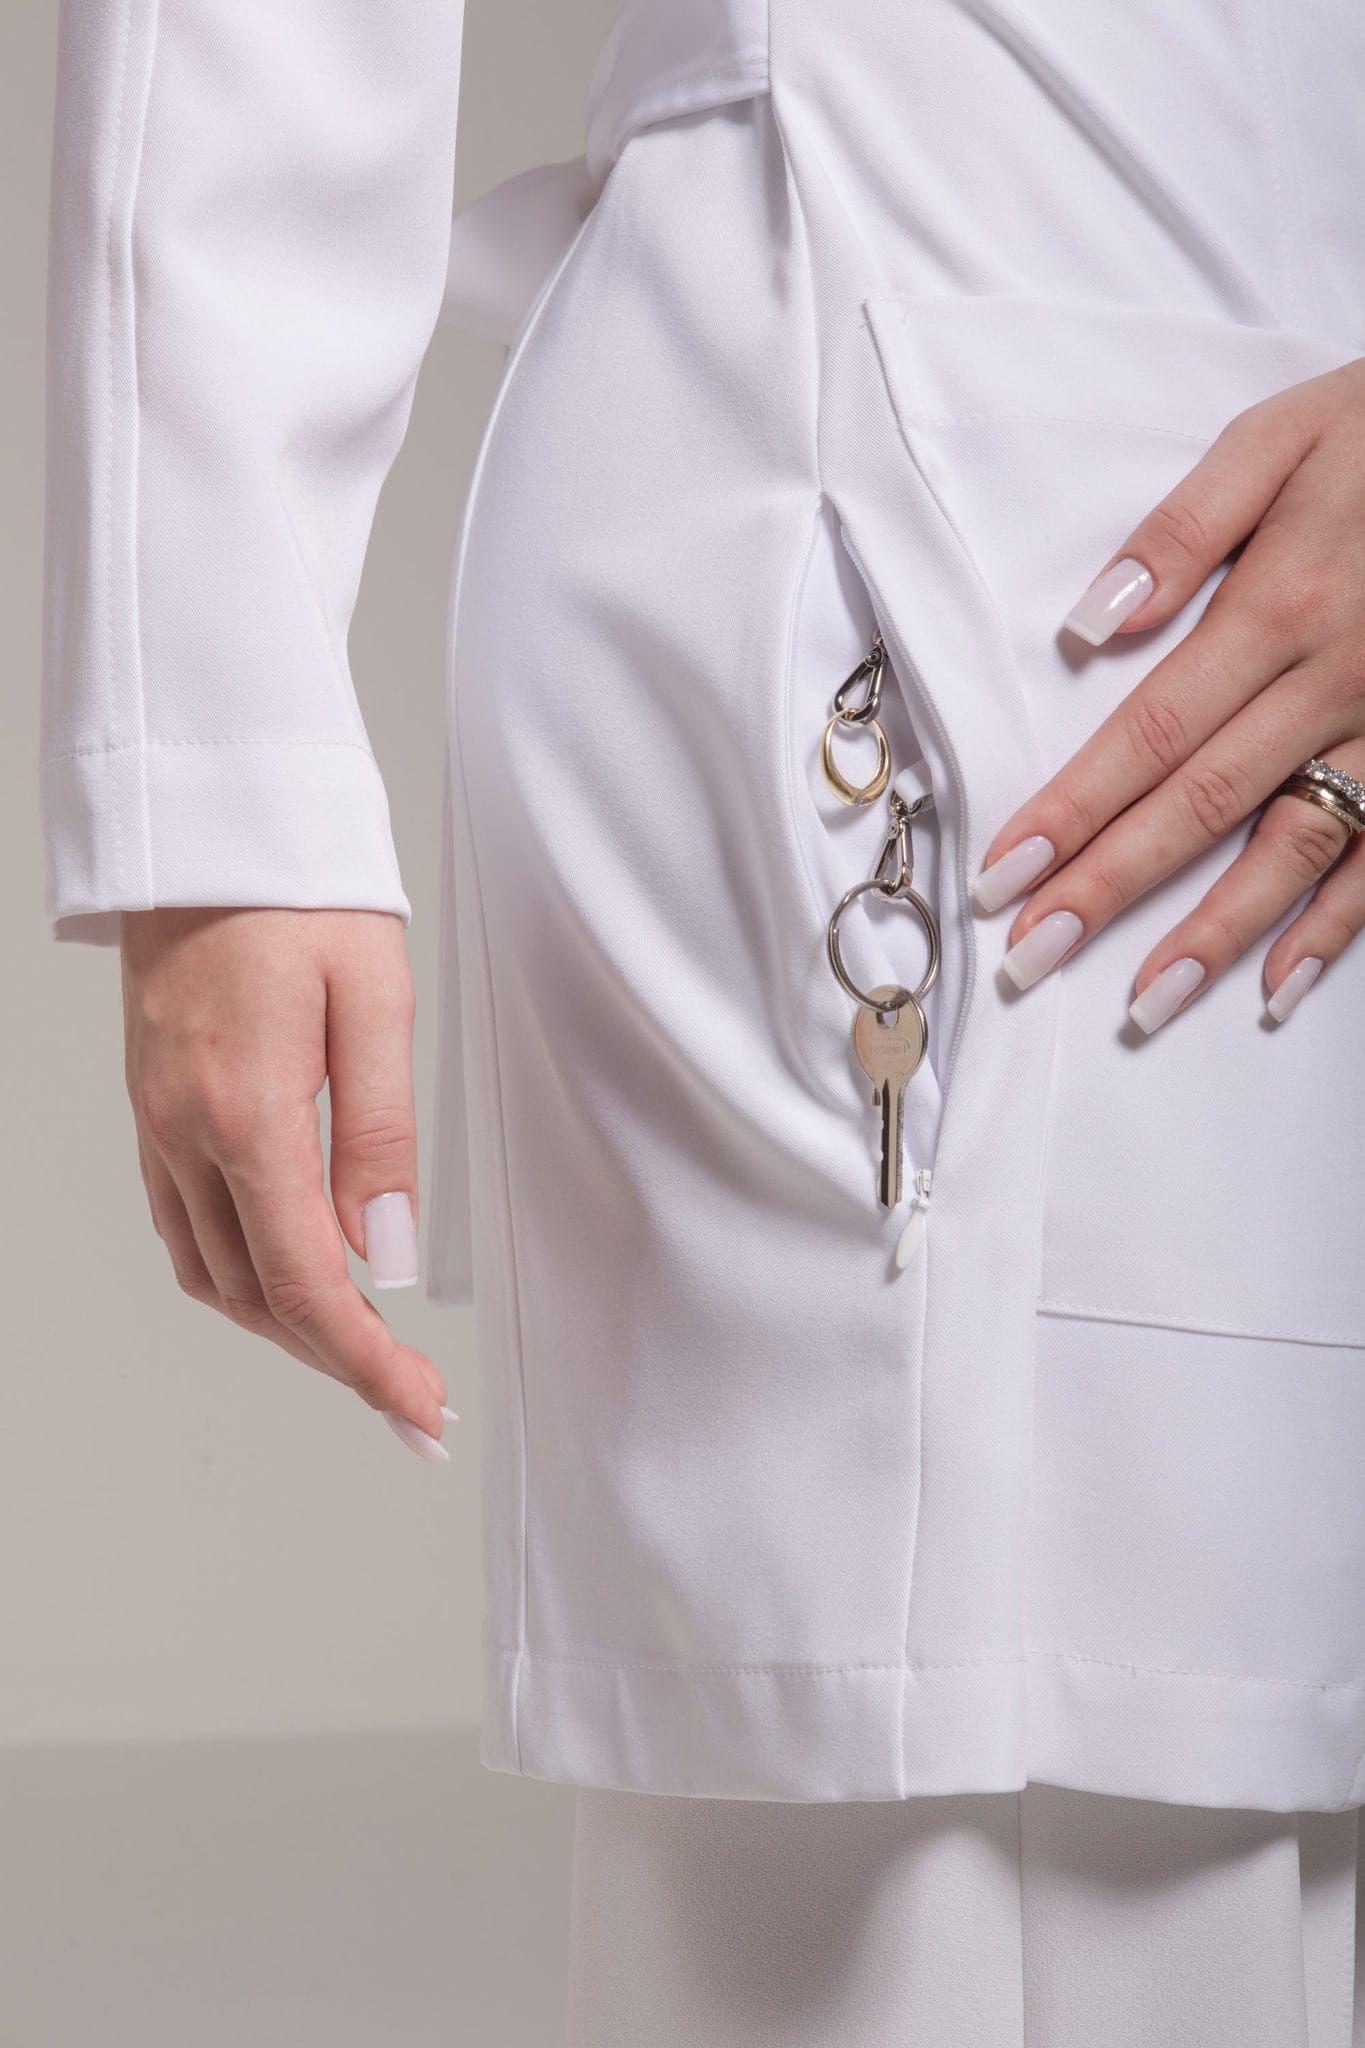 Jaleco Premium Dorothea KL02 | Klinik Jalecos. Premium Lab Coats.